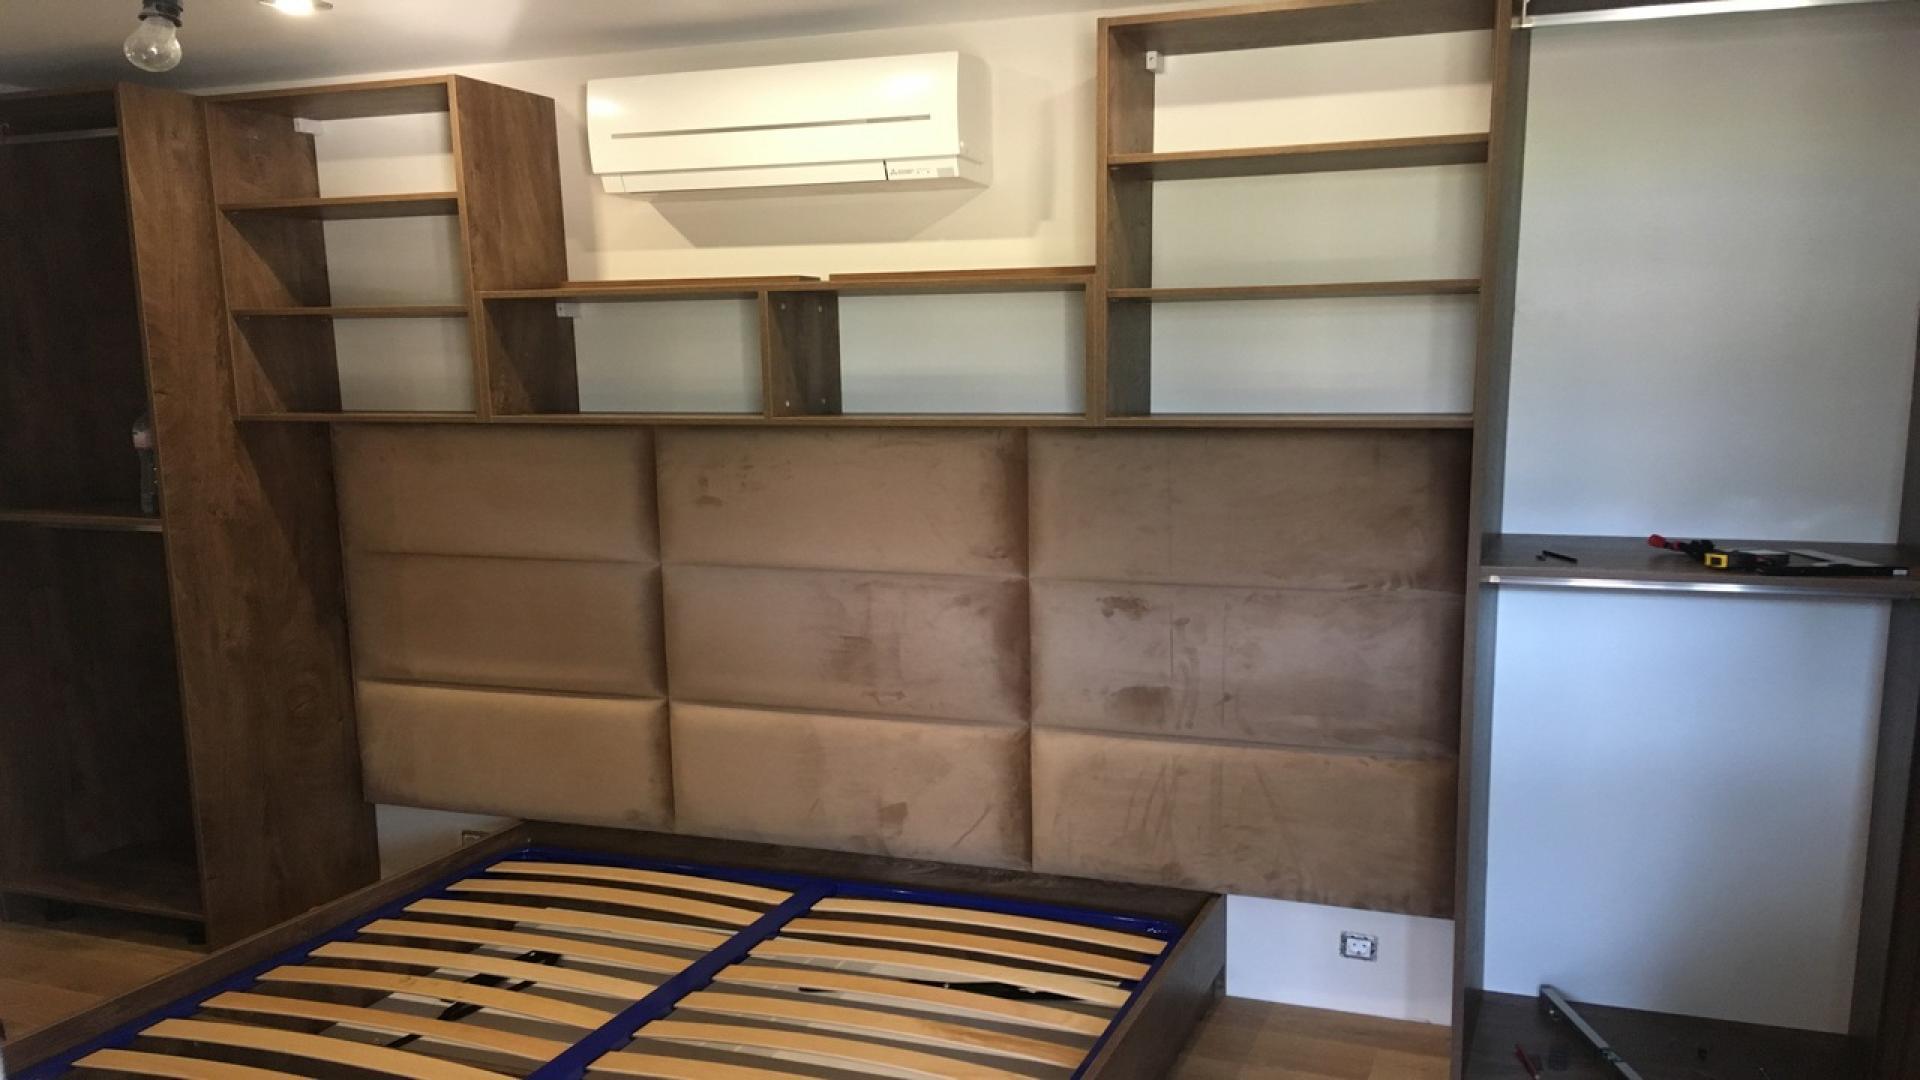 spalnq-po-proekt-Bedroom-Furniture-KN-furnish-design